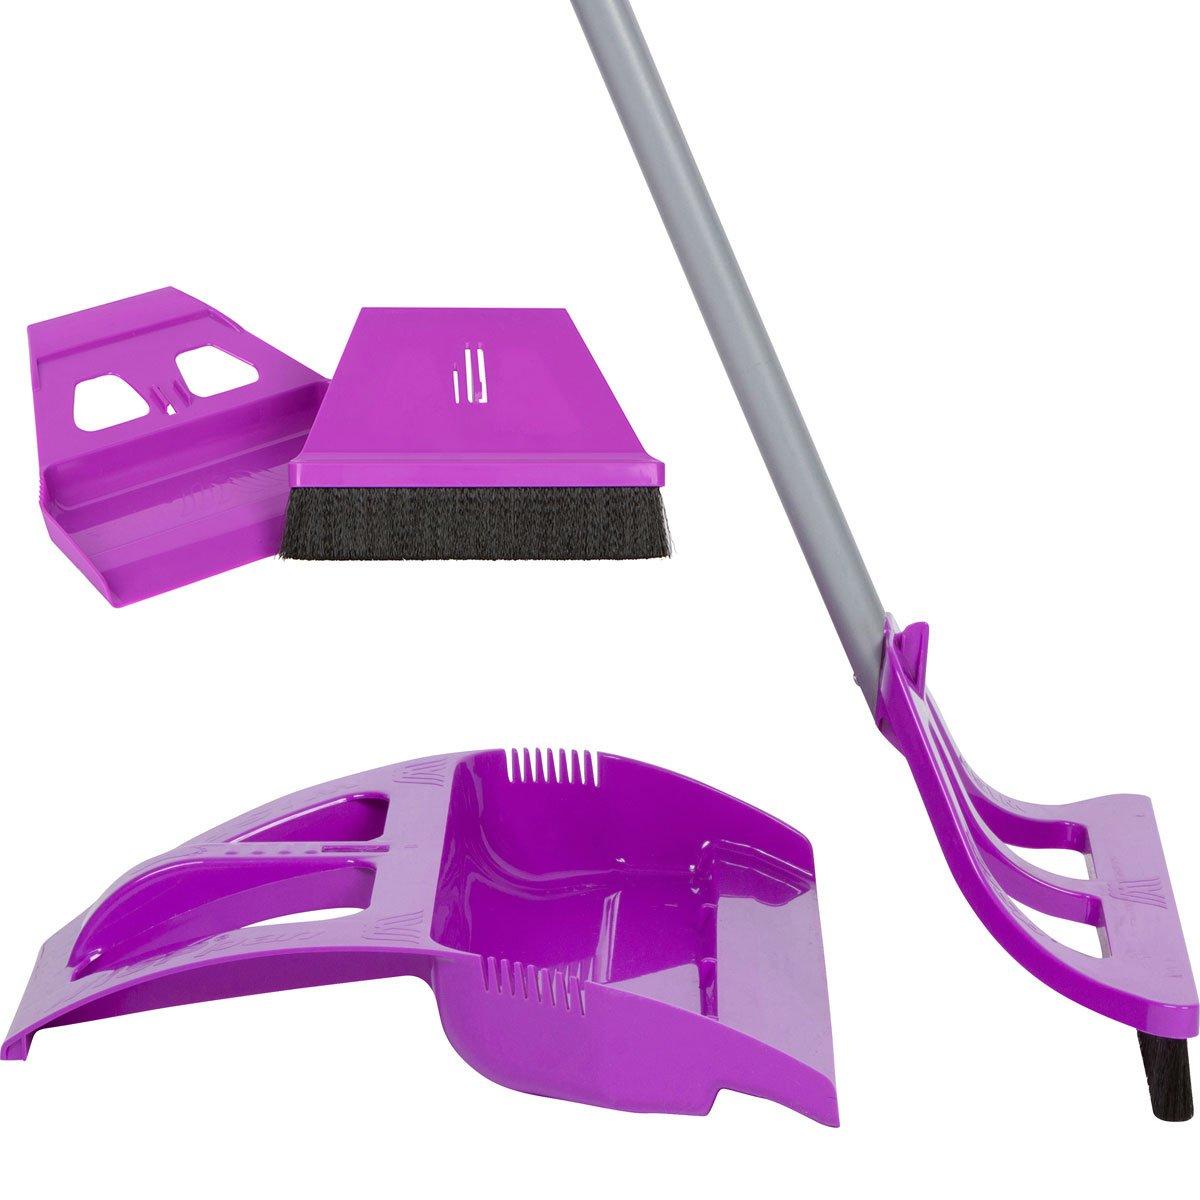 WISP Cleaning Set WISPsystem Telescoping Broom and Dustpan with miniWISP Hand Broom w/Bristle Seal Technology (Purple)